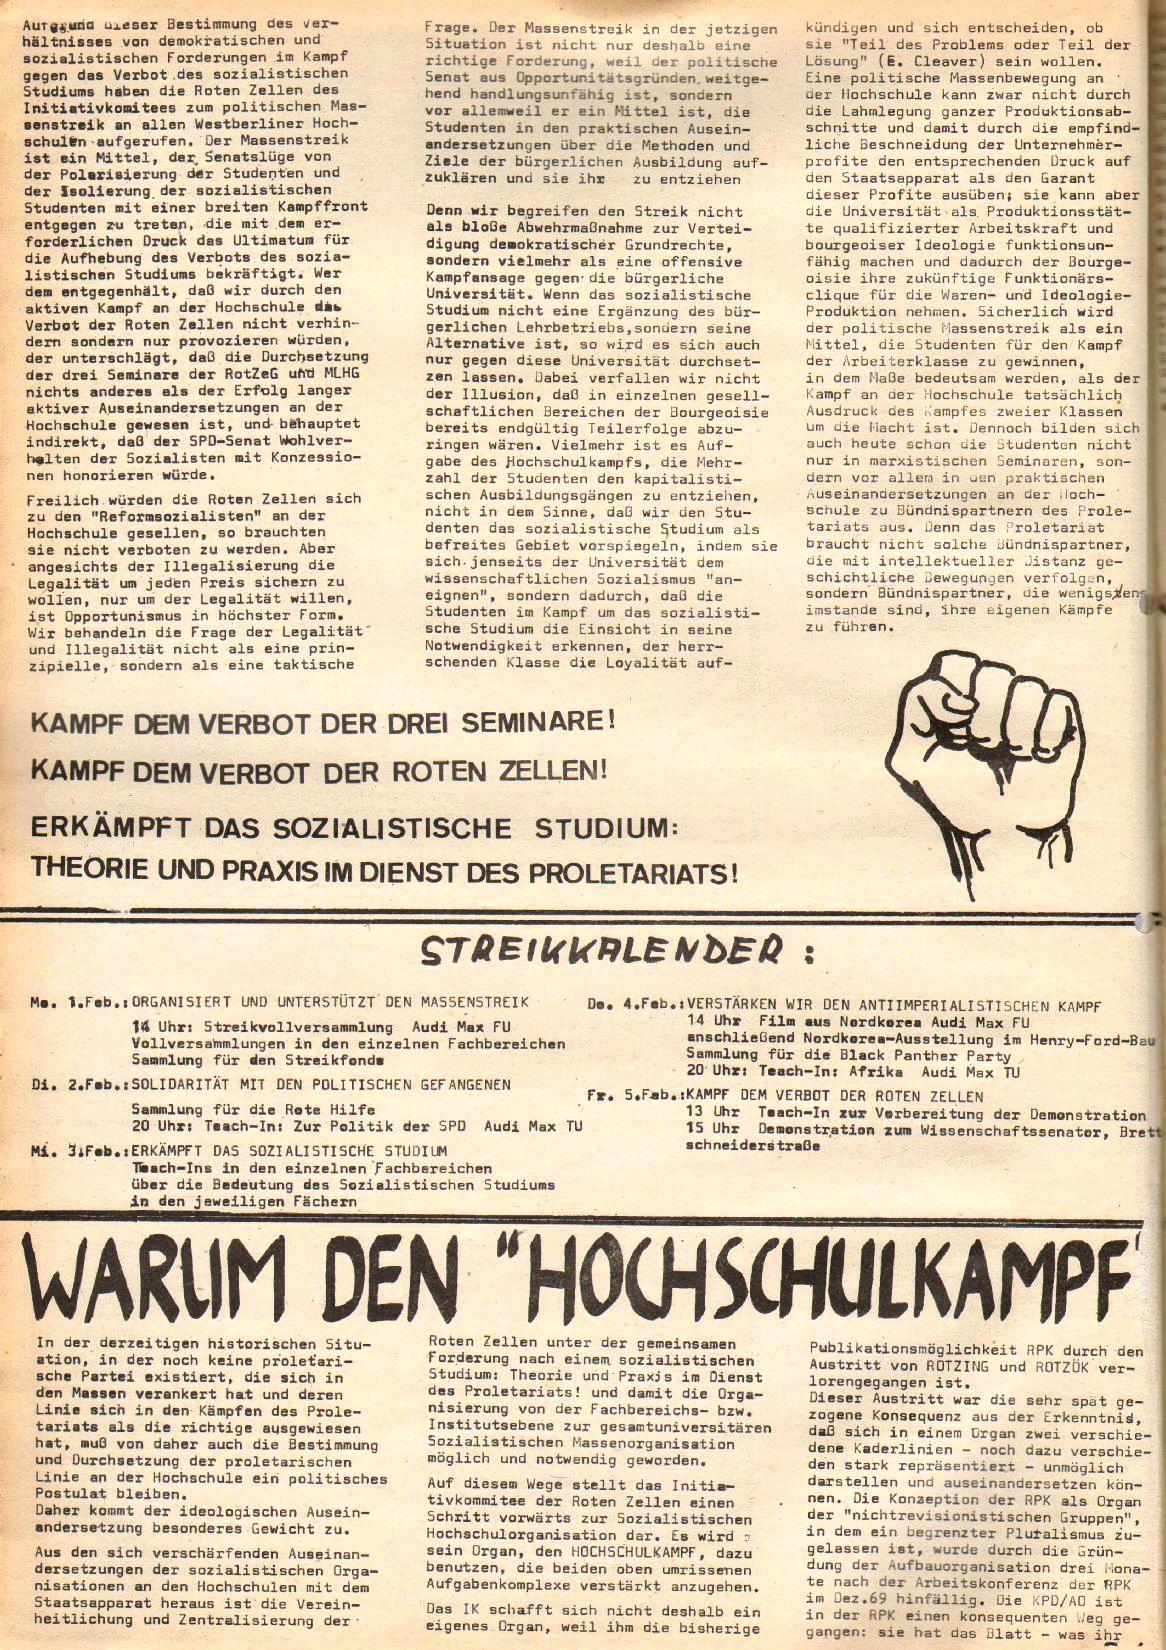 Berlin_Hochschulkampf_1971_01_04